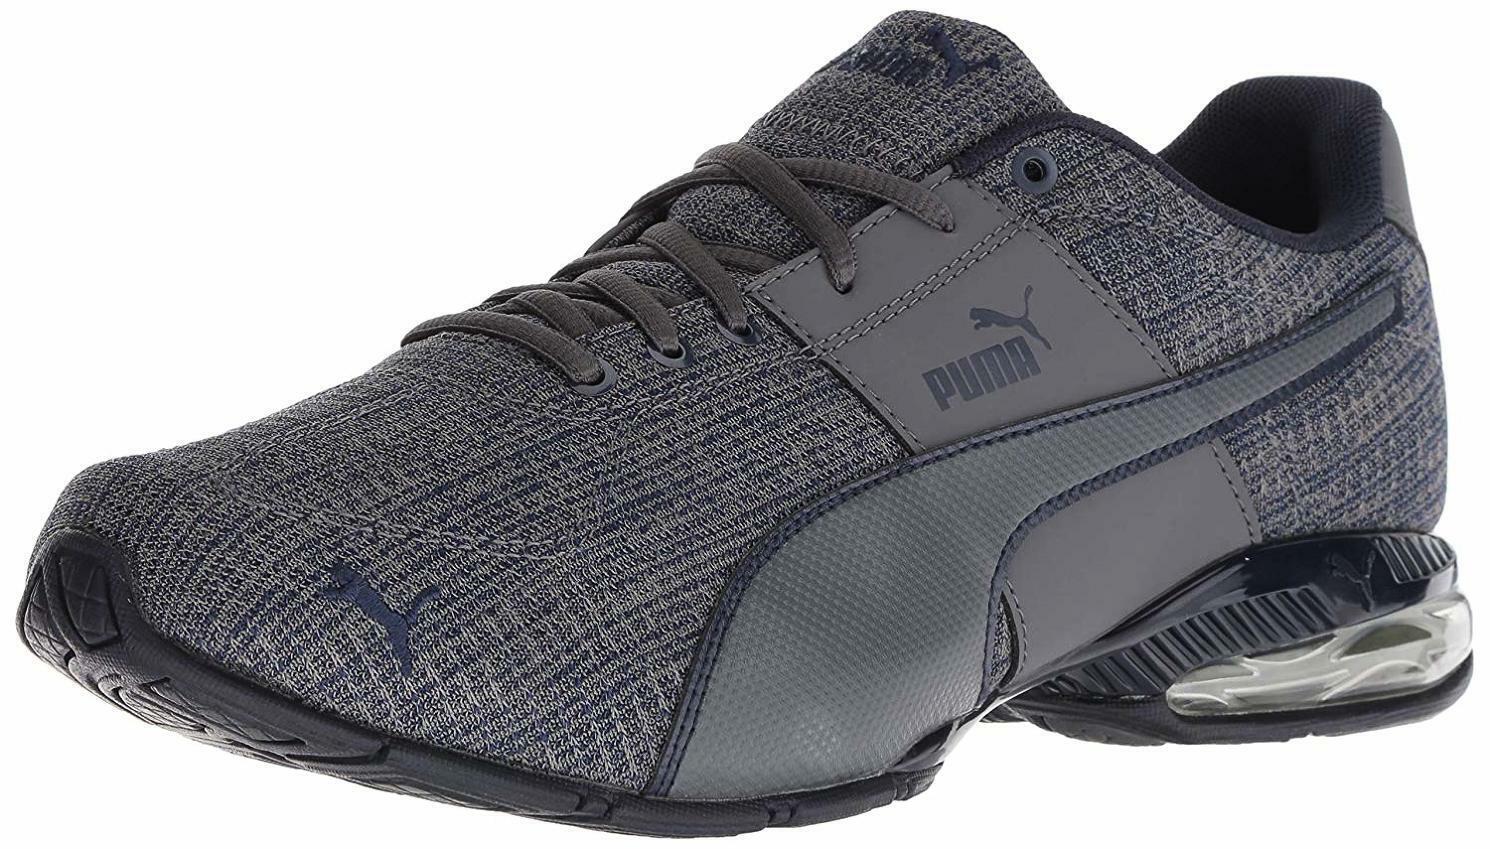 PUMA Uomo Cell Surin 2 Fm scarpe da ginnastica - - - Choose SZ Coloree 041b8c